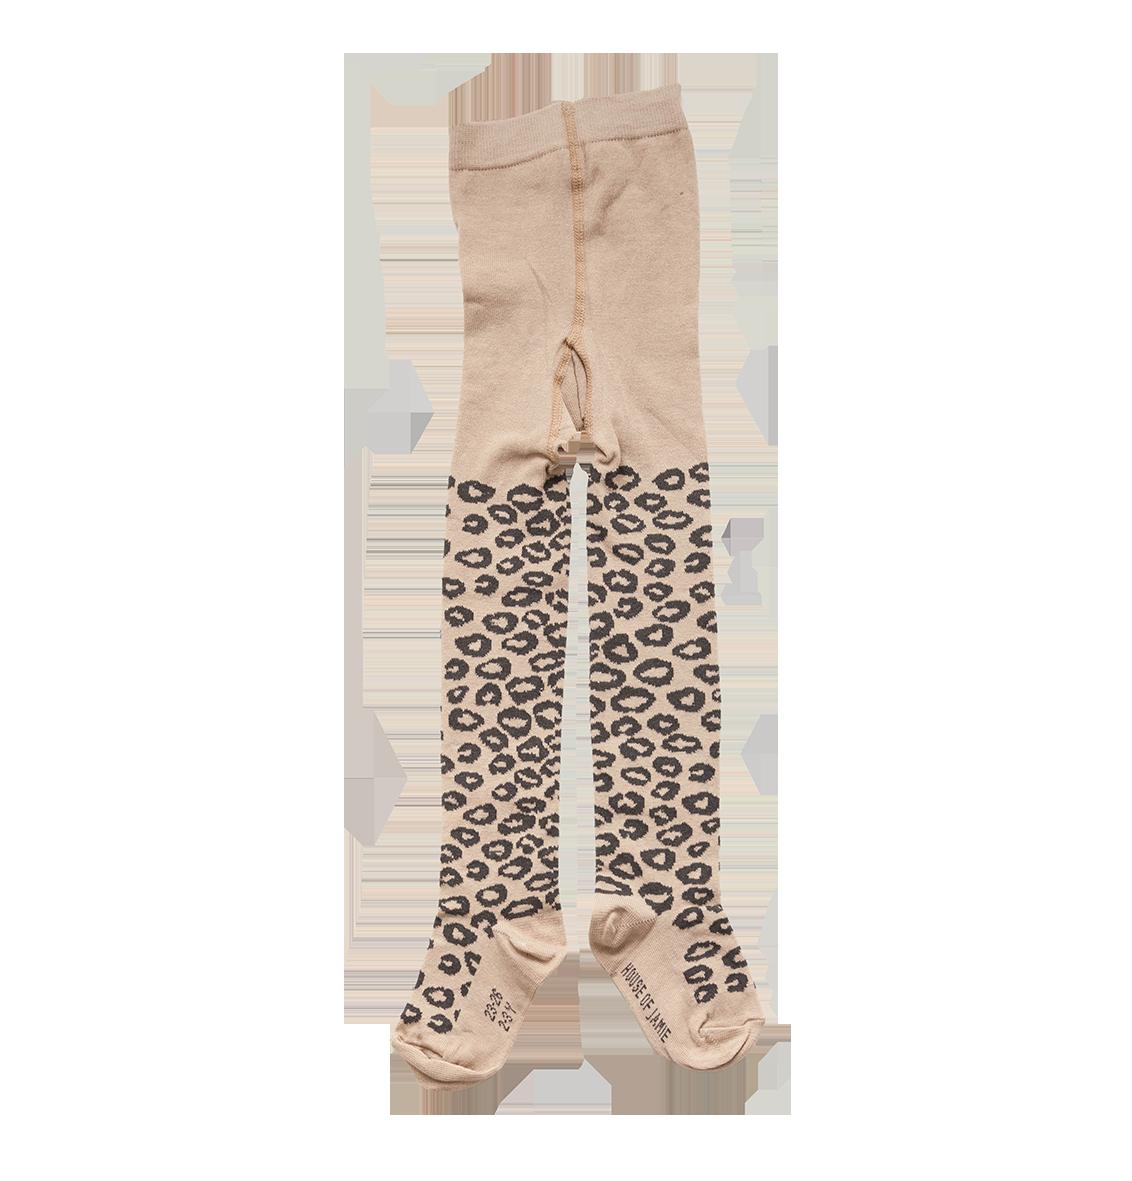 Maillot leopard karamel-1